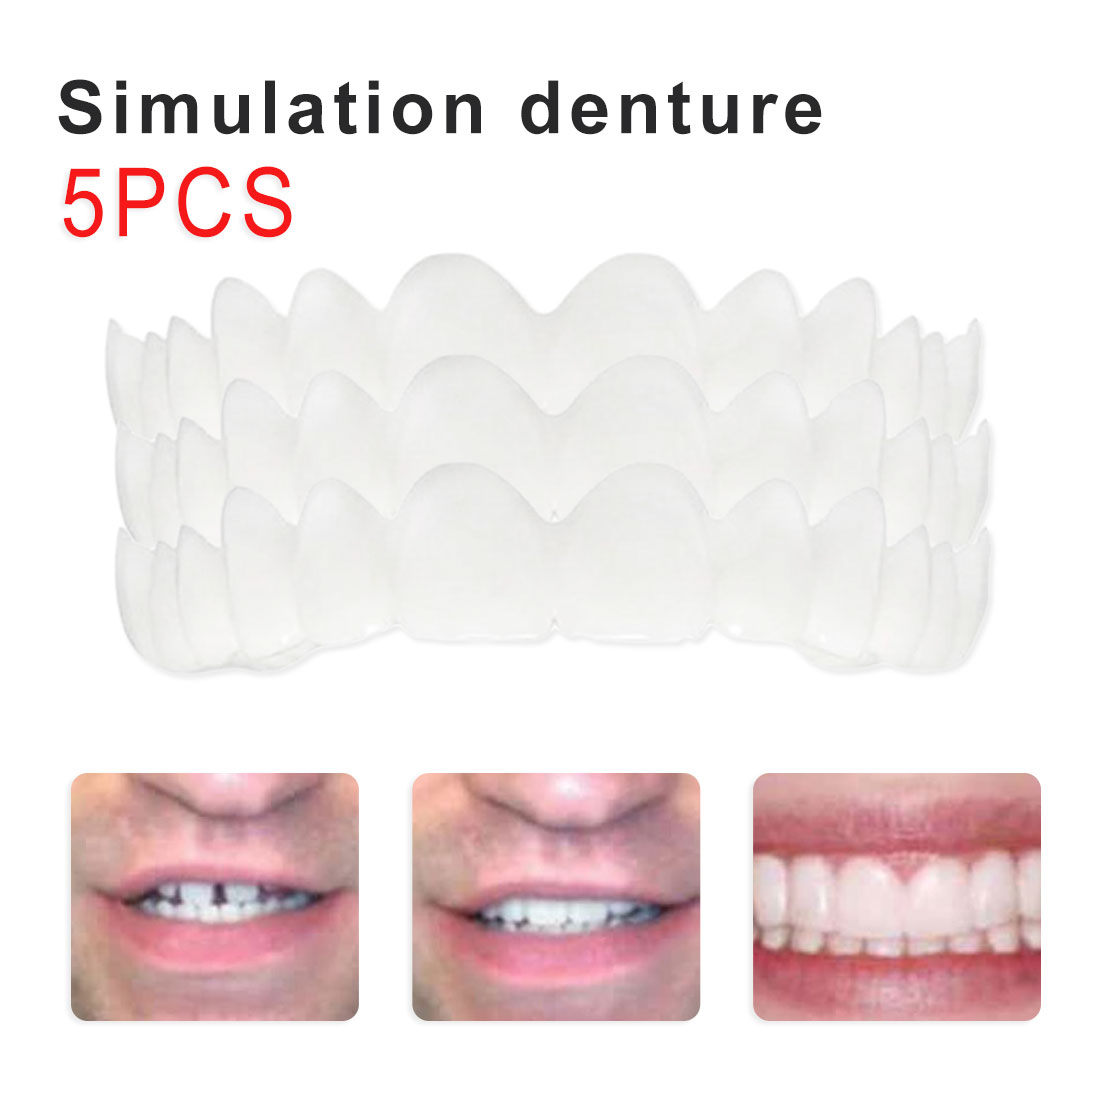 5pcs White Comfort Fit Flex White Fake Teeth Veneer Top Prosthesis For Men Women Cosmetic Veneer Oral Supplies Appliances